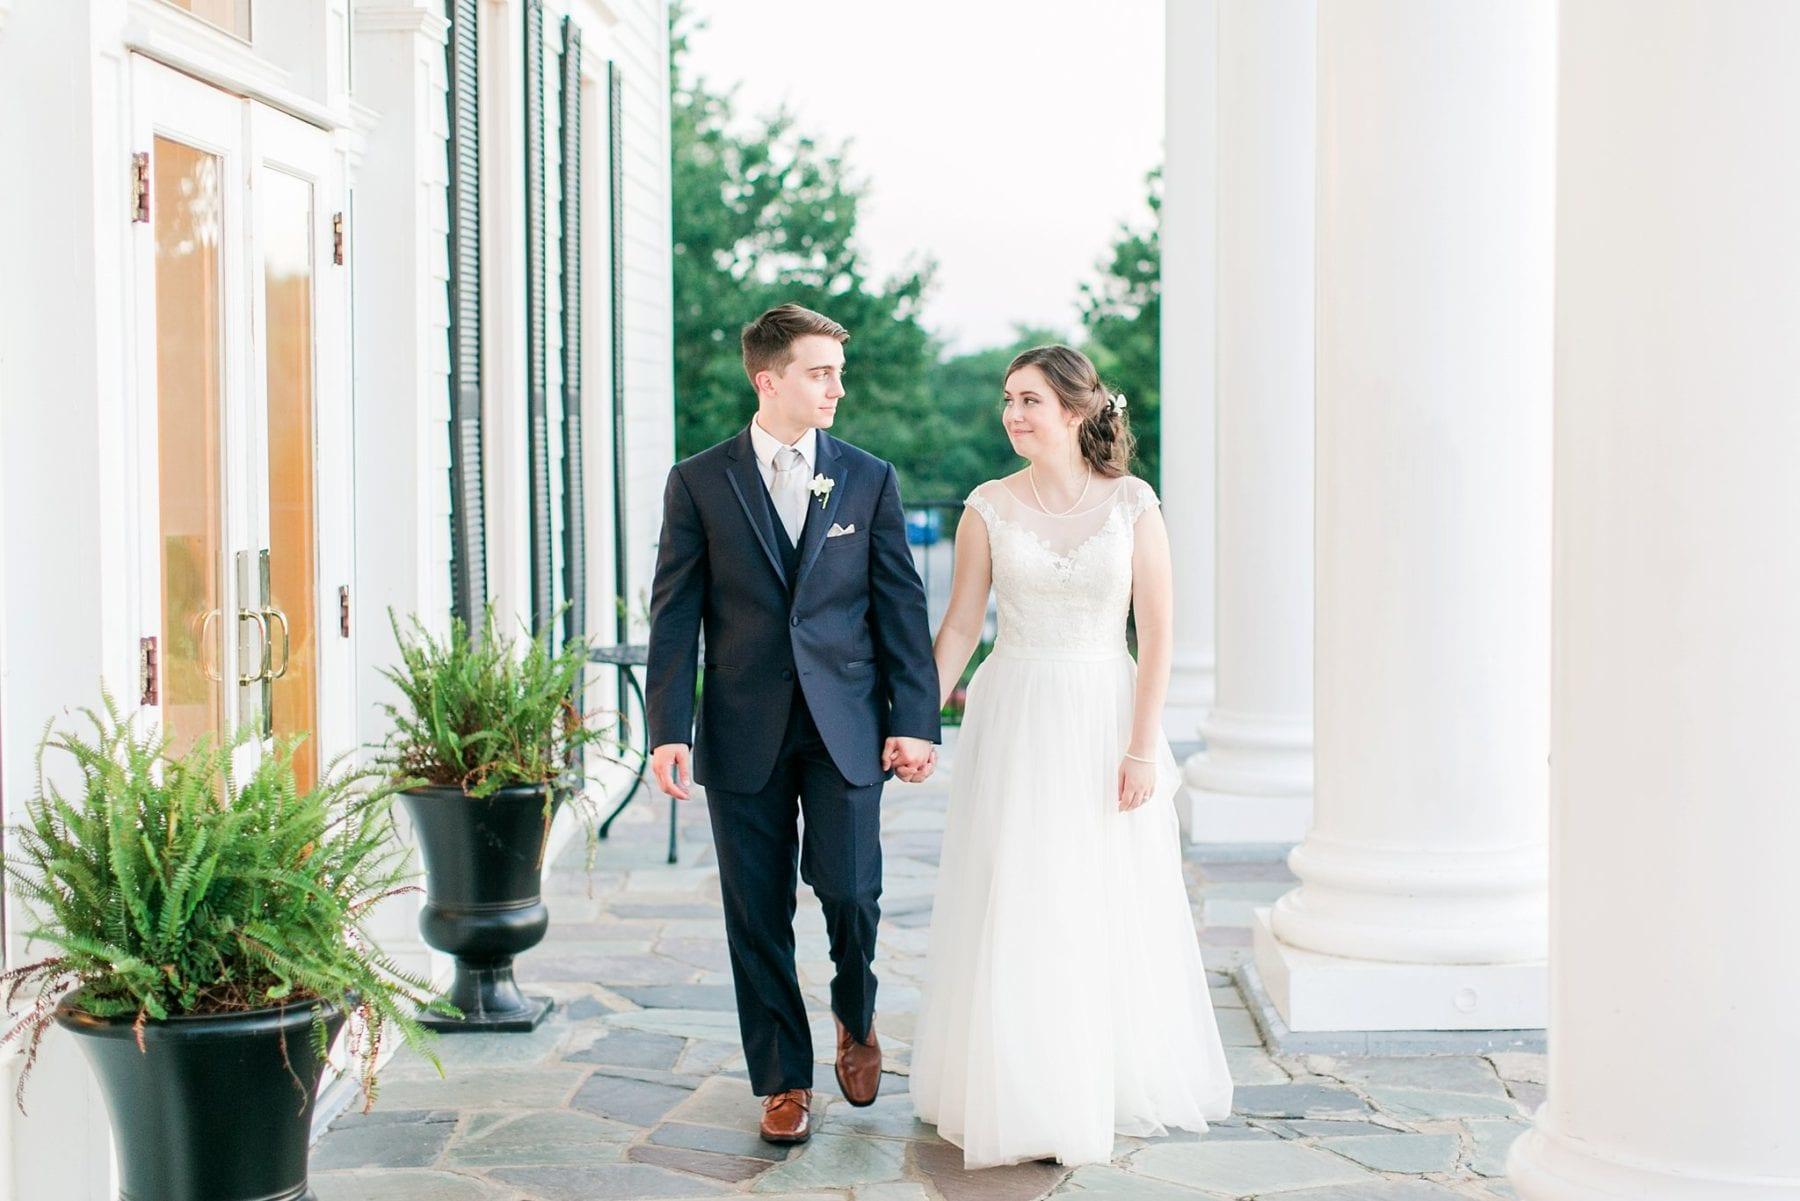 Bristow Manor Wedding Photos Virginia Wedding Photographer Lauren & Andrew Megan Kelsey Photography-633.jpg